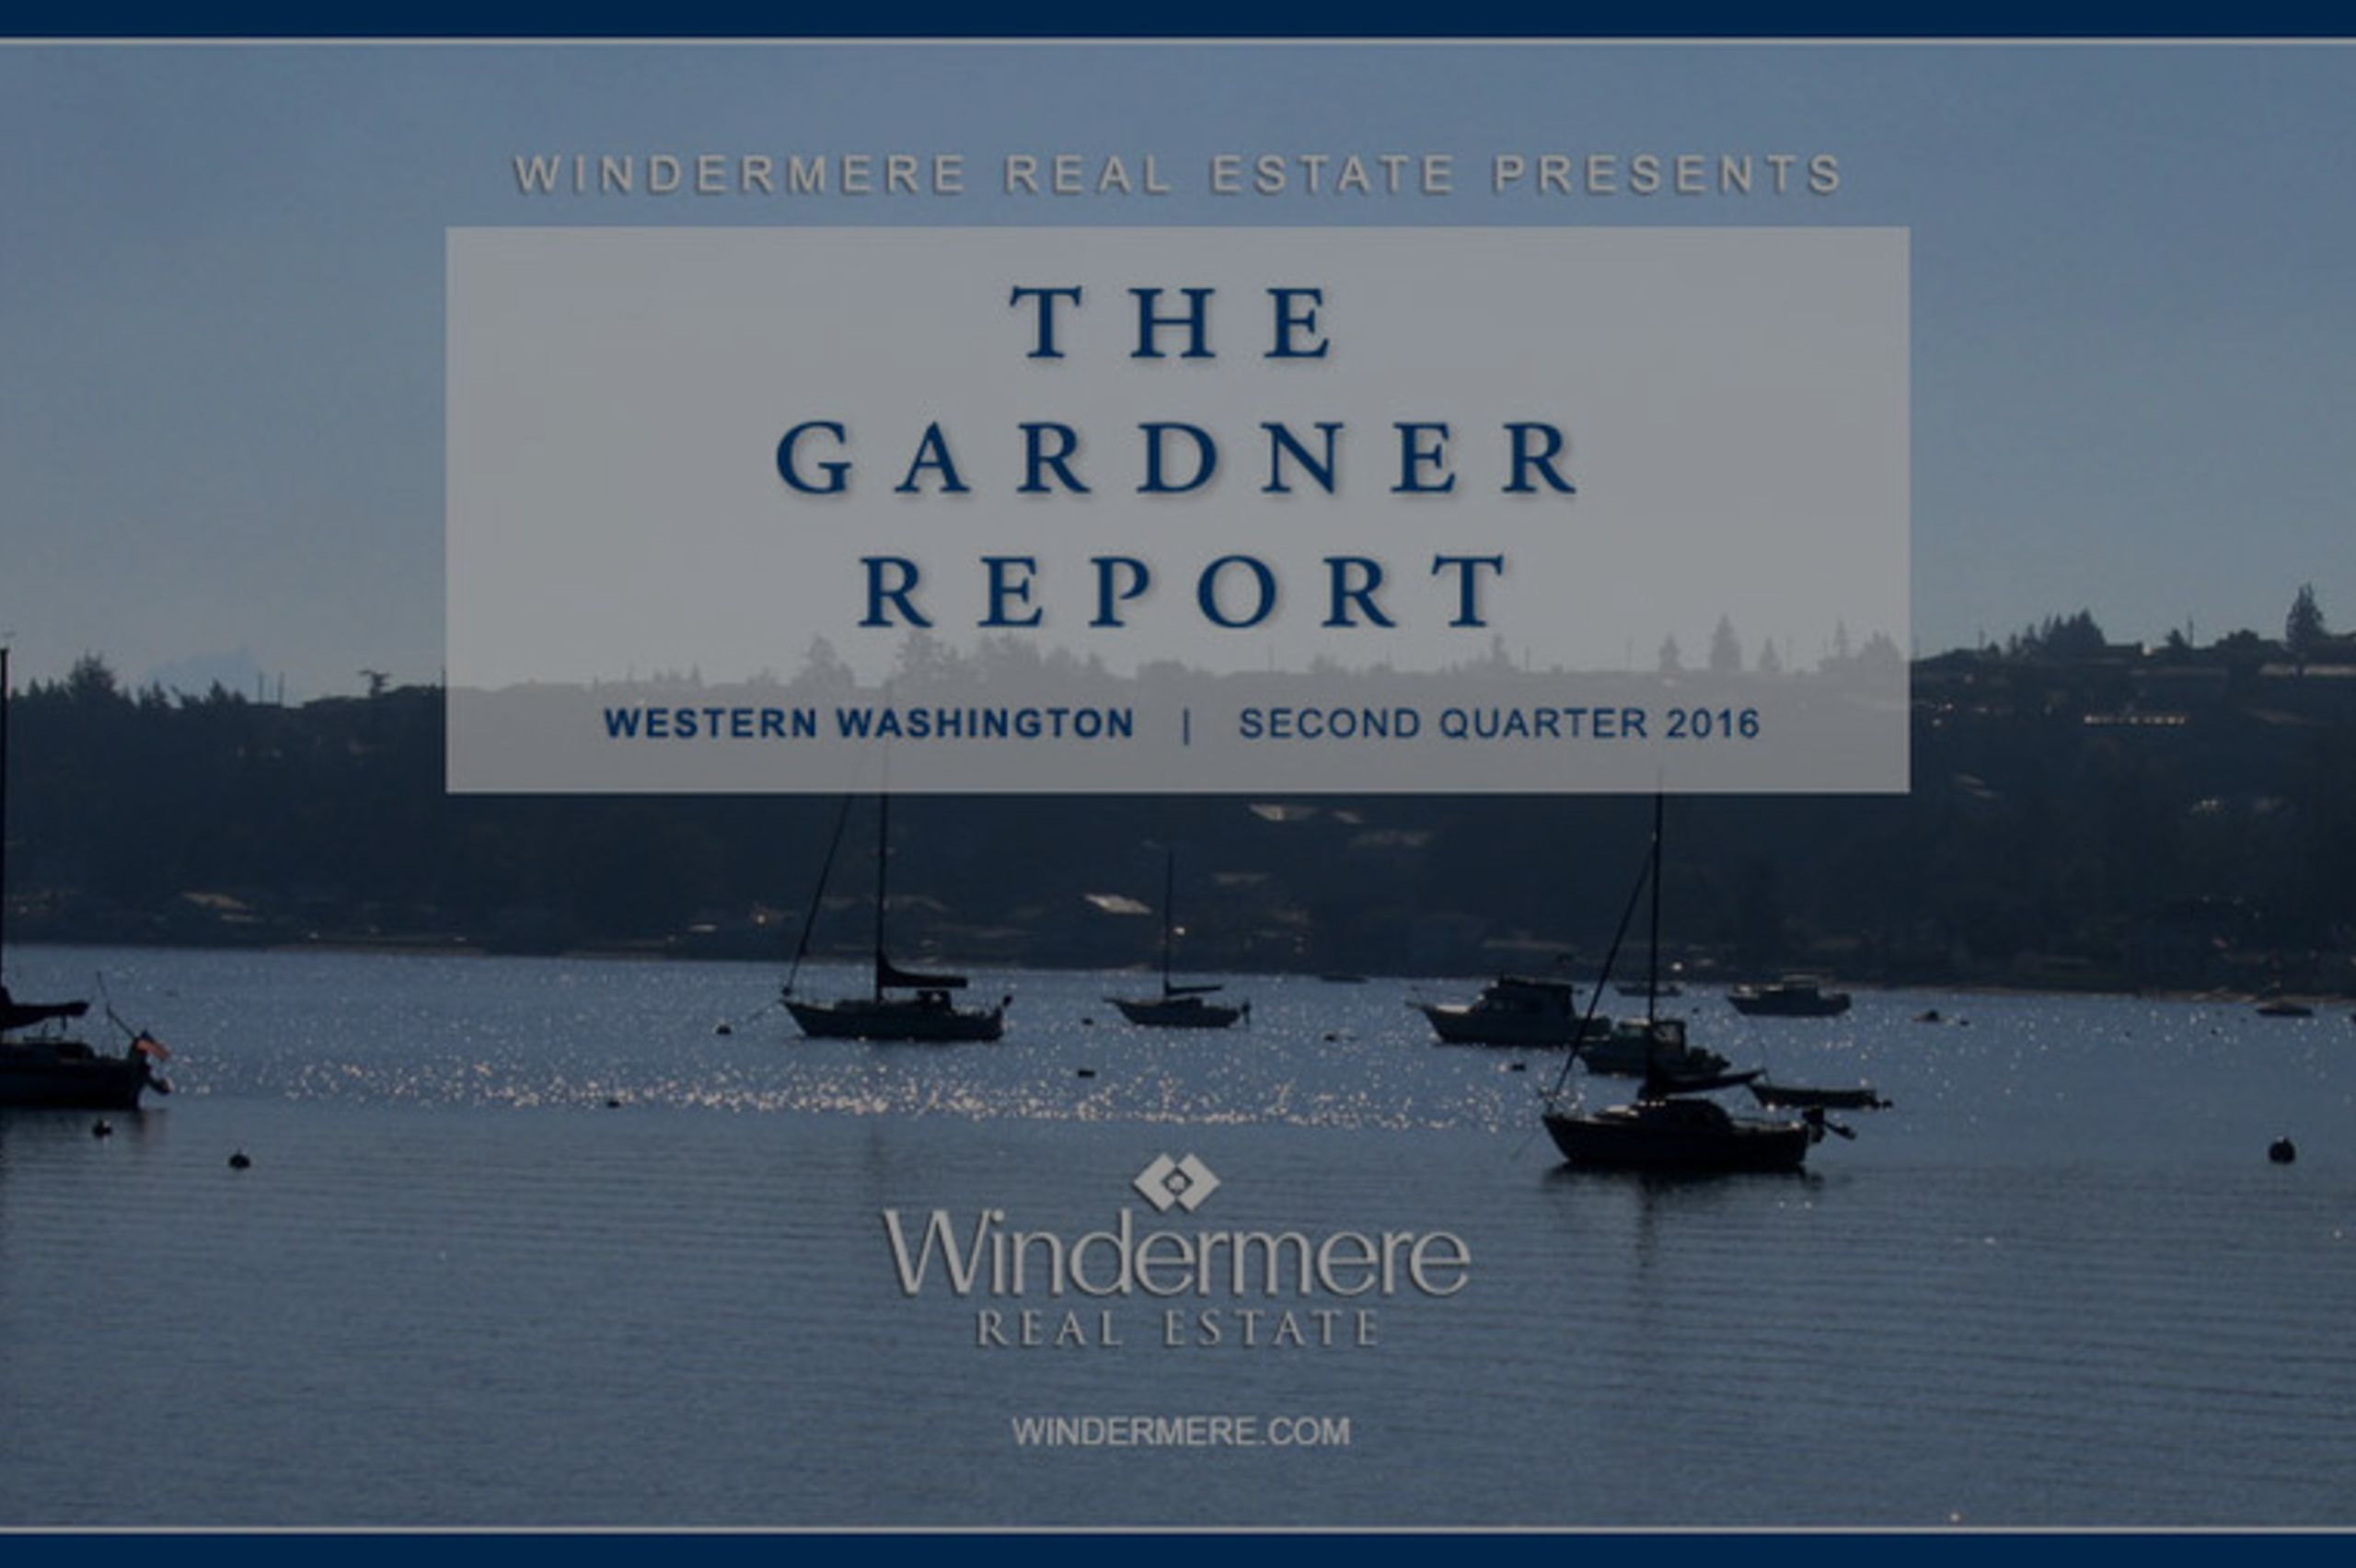 Western Washington Real Estate Market Report